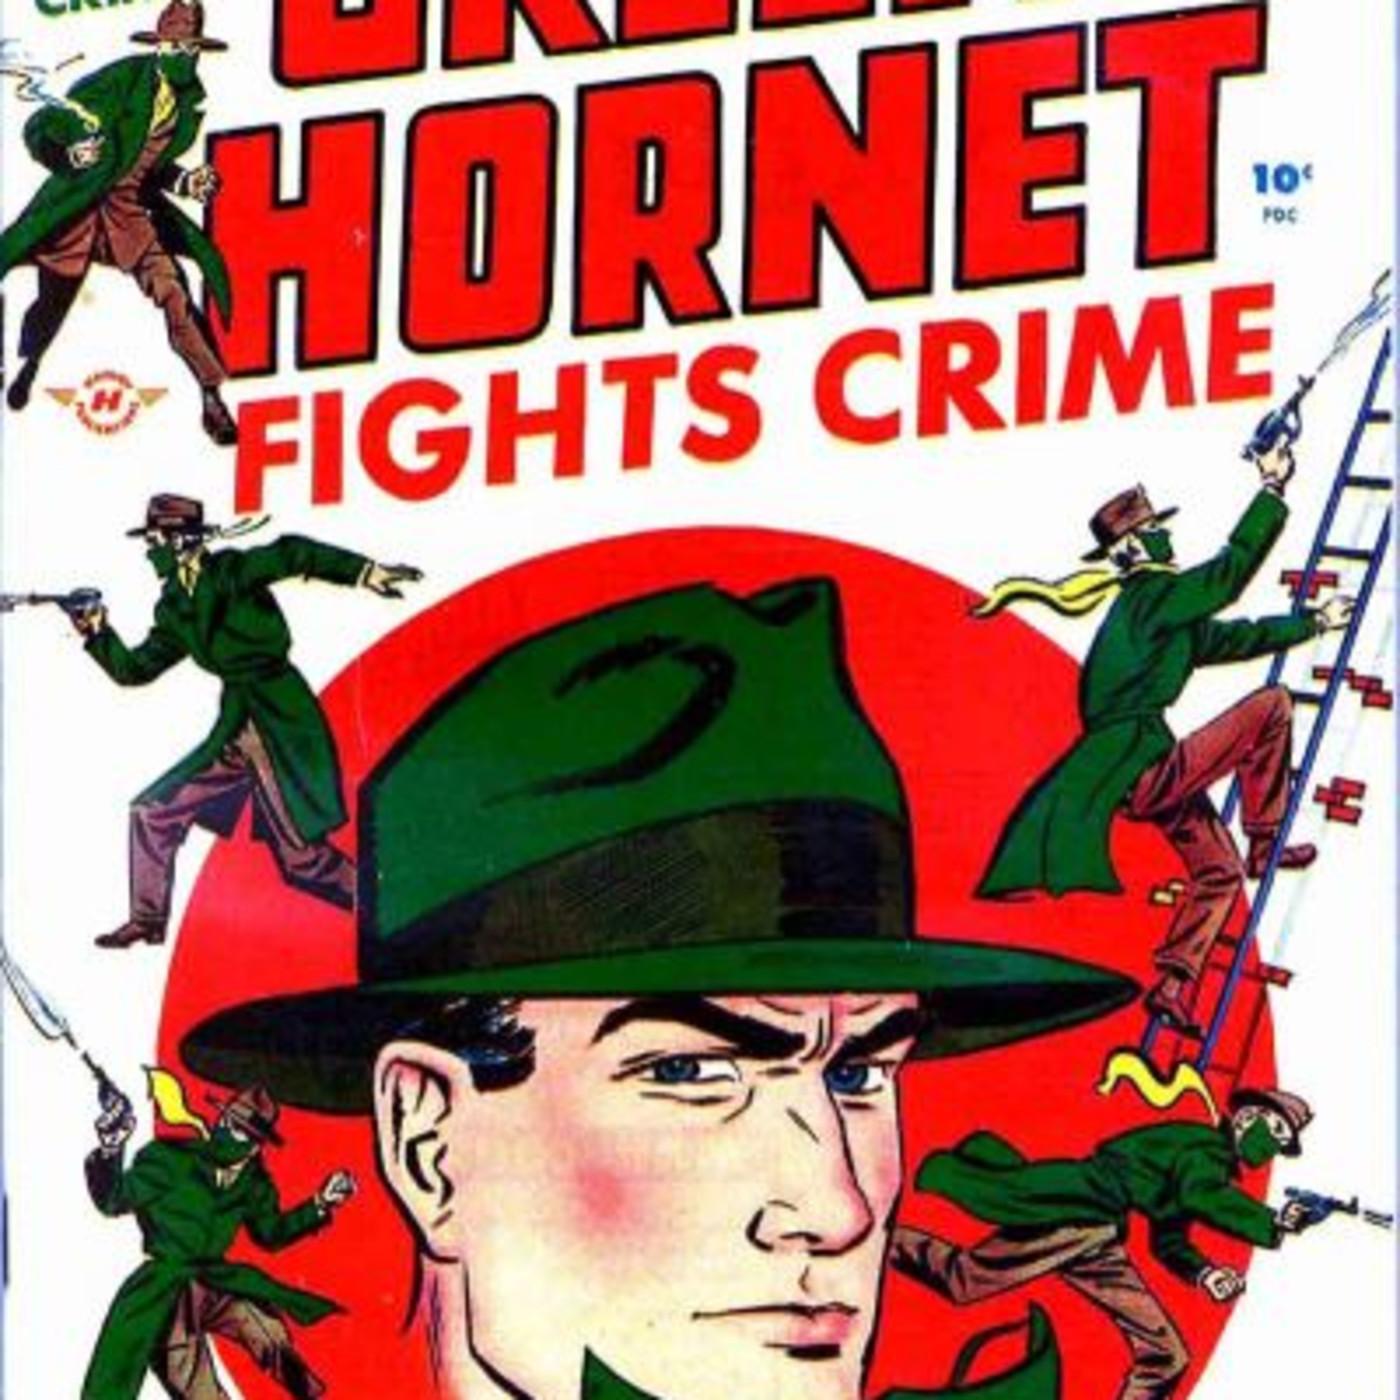 The Green Hornet - 00 - 451018MurderAndTheDoperacket